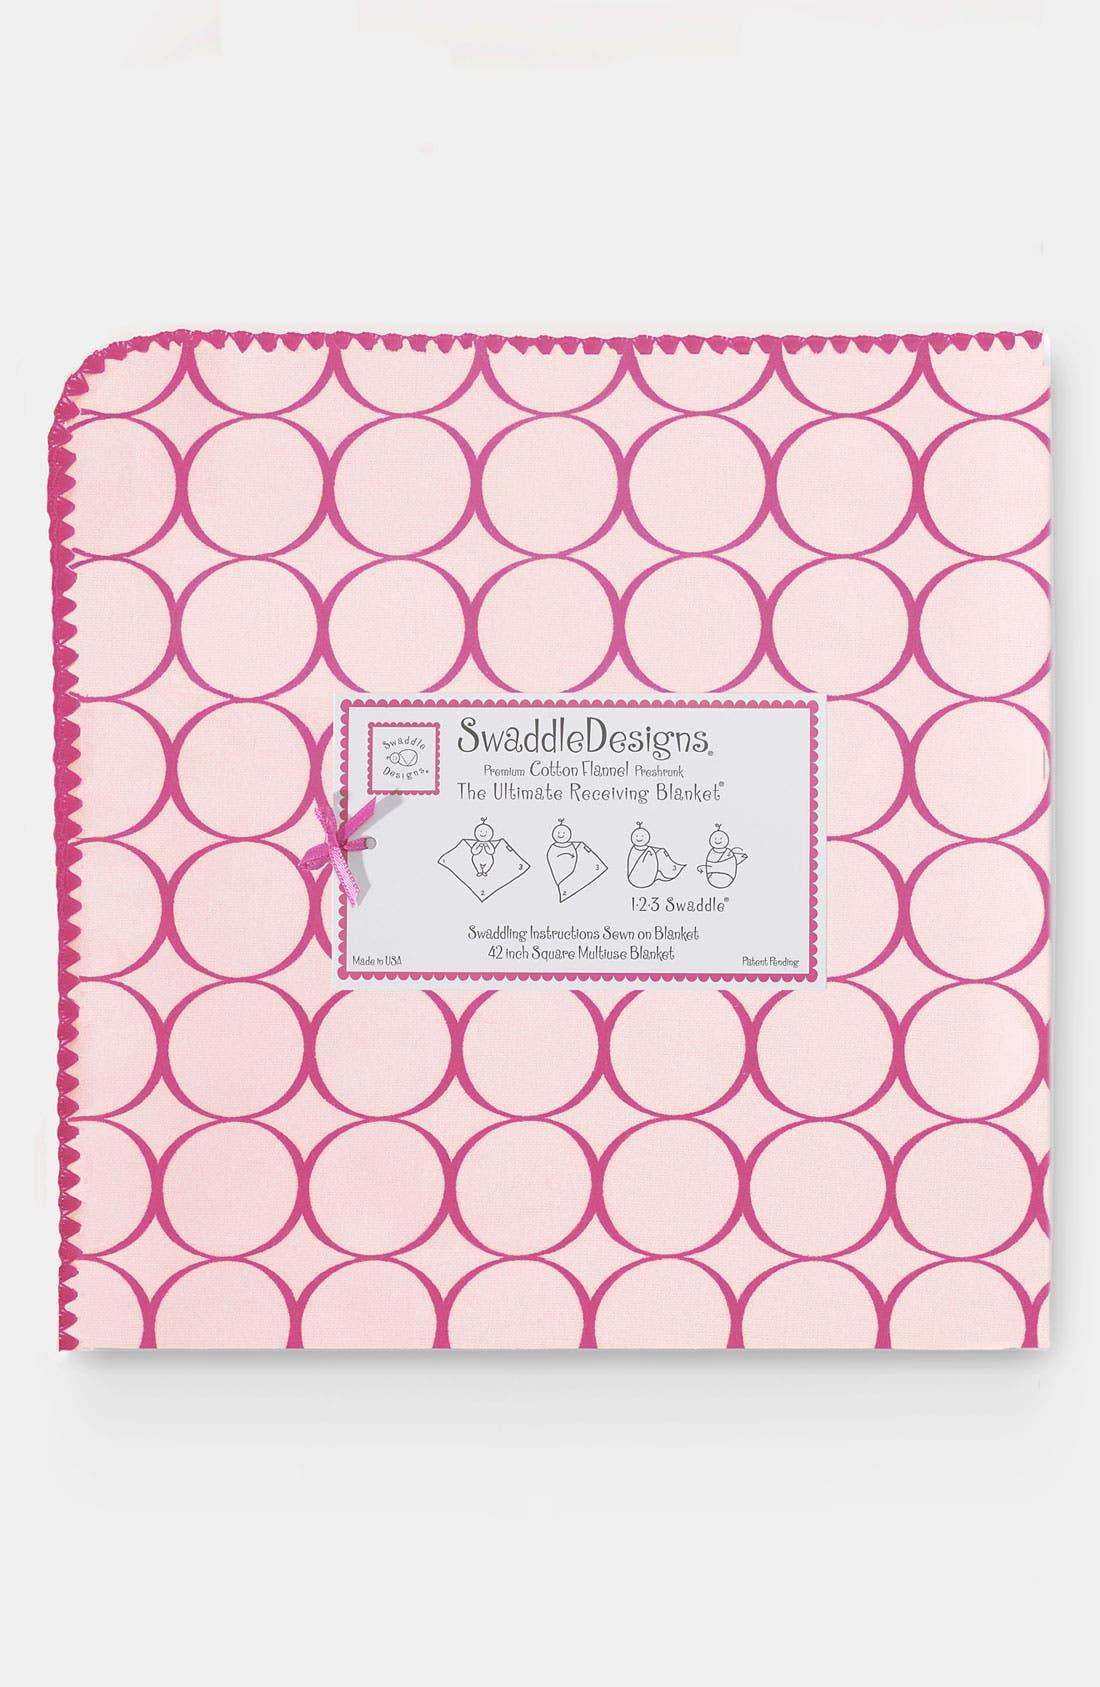 Main Image - Swaddle Designs 'Ultimate' Receiving Blanket